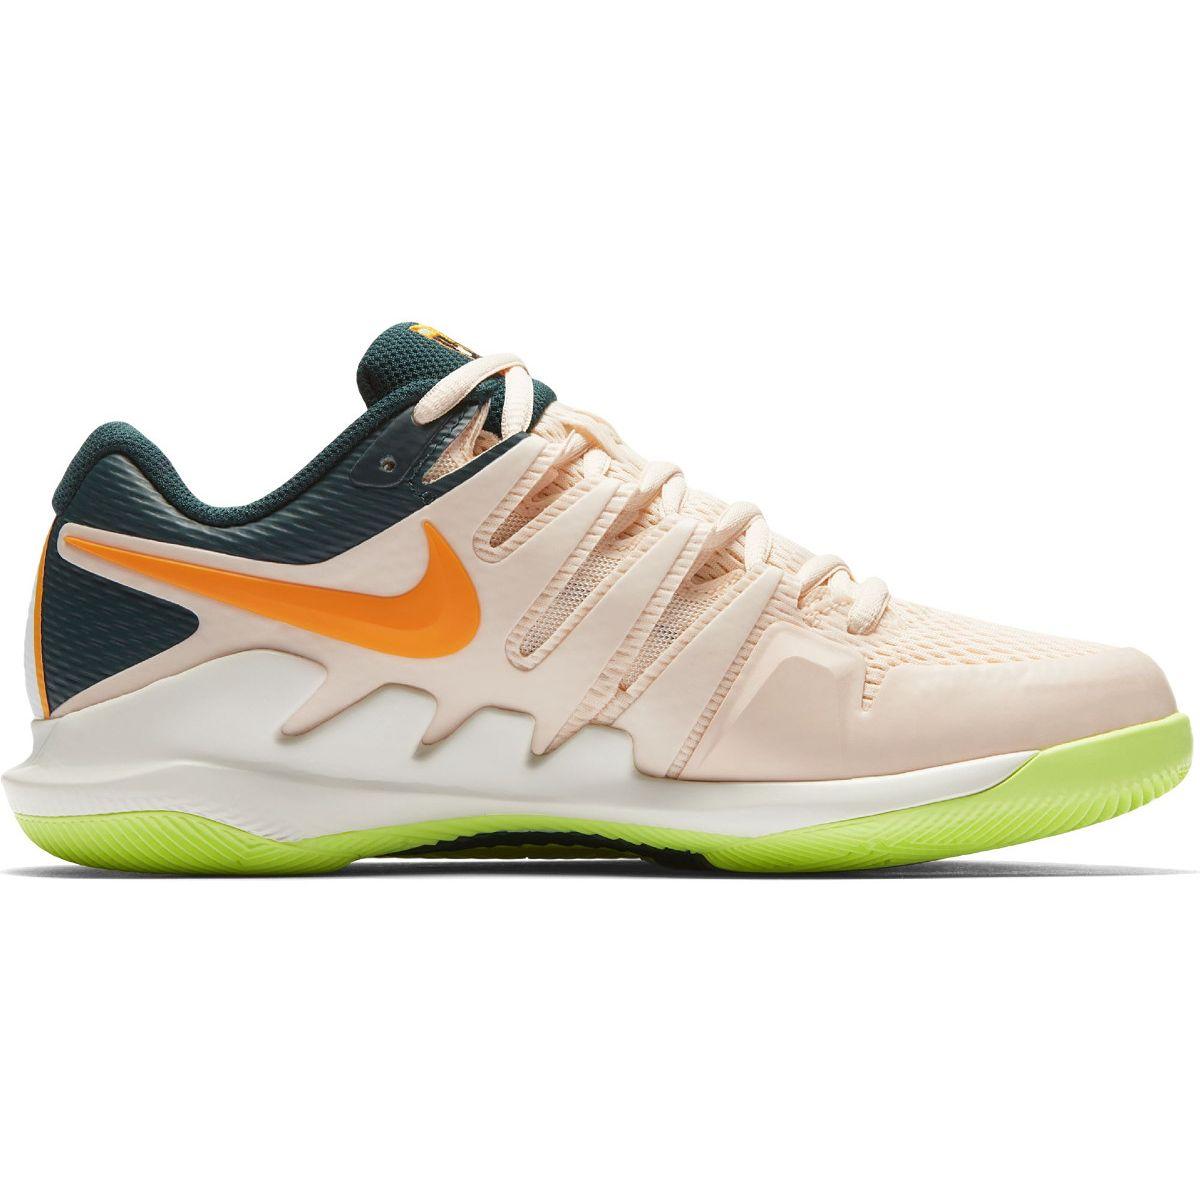 Nike Air Zoom Vapor X Women's Tennis Shoes